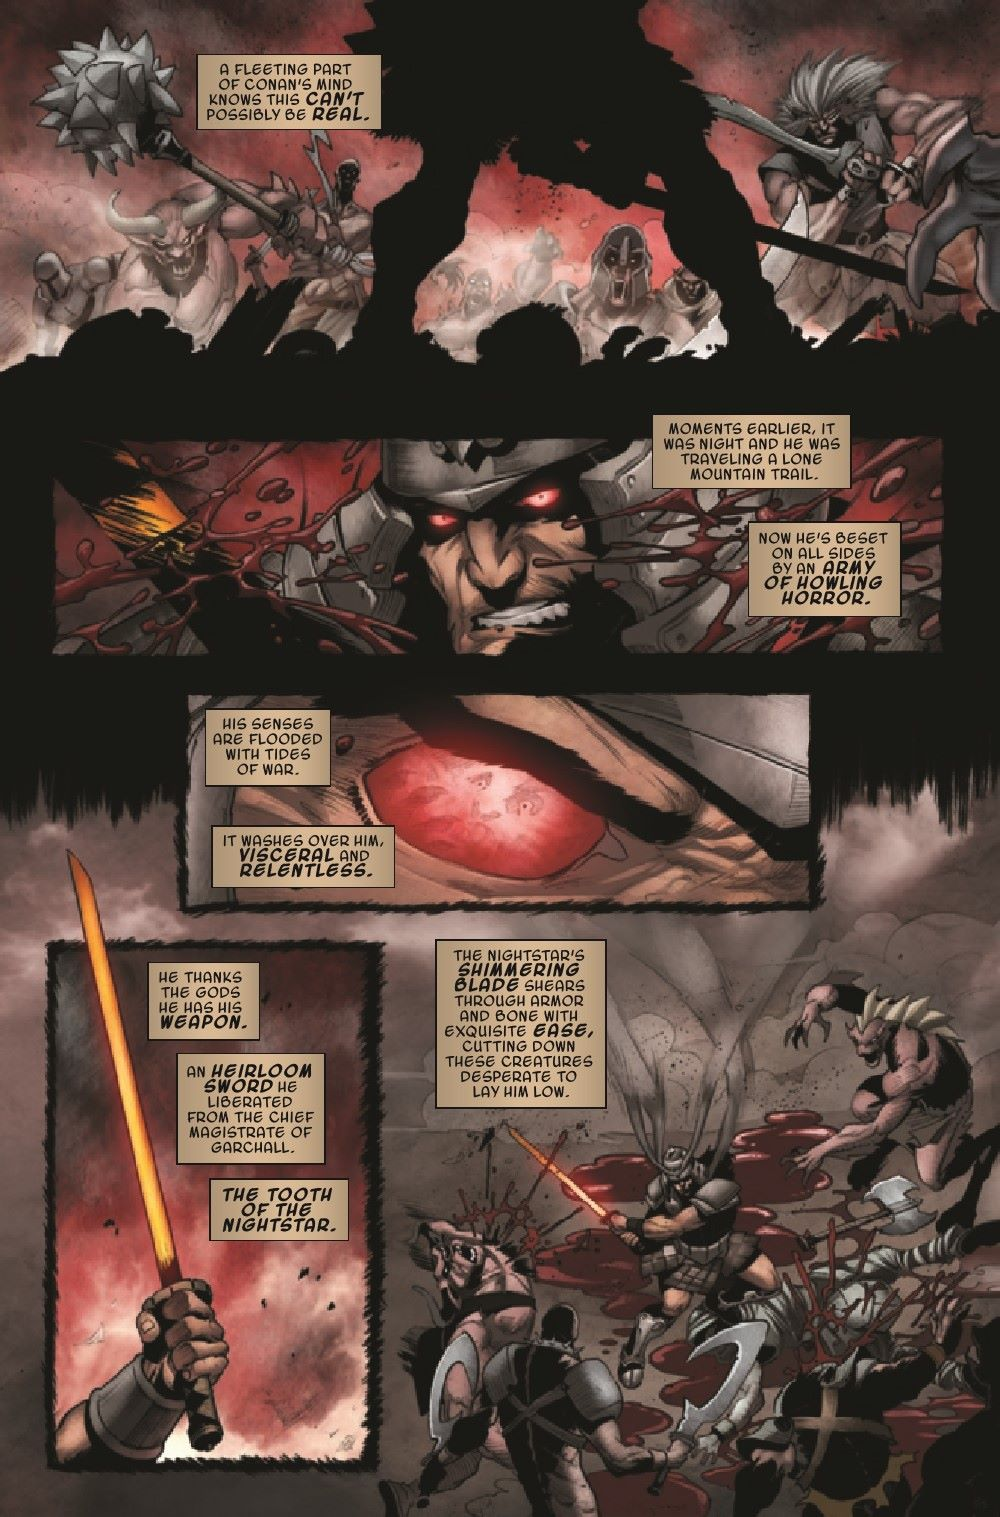 CONANBARB2019018_Preview-6 ComicList Previews: CONAN THE BARBARIAN #18